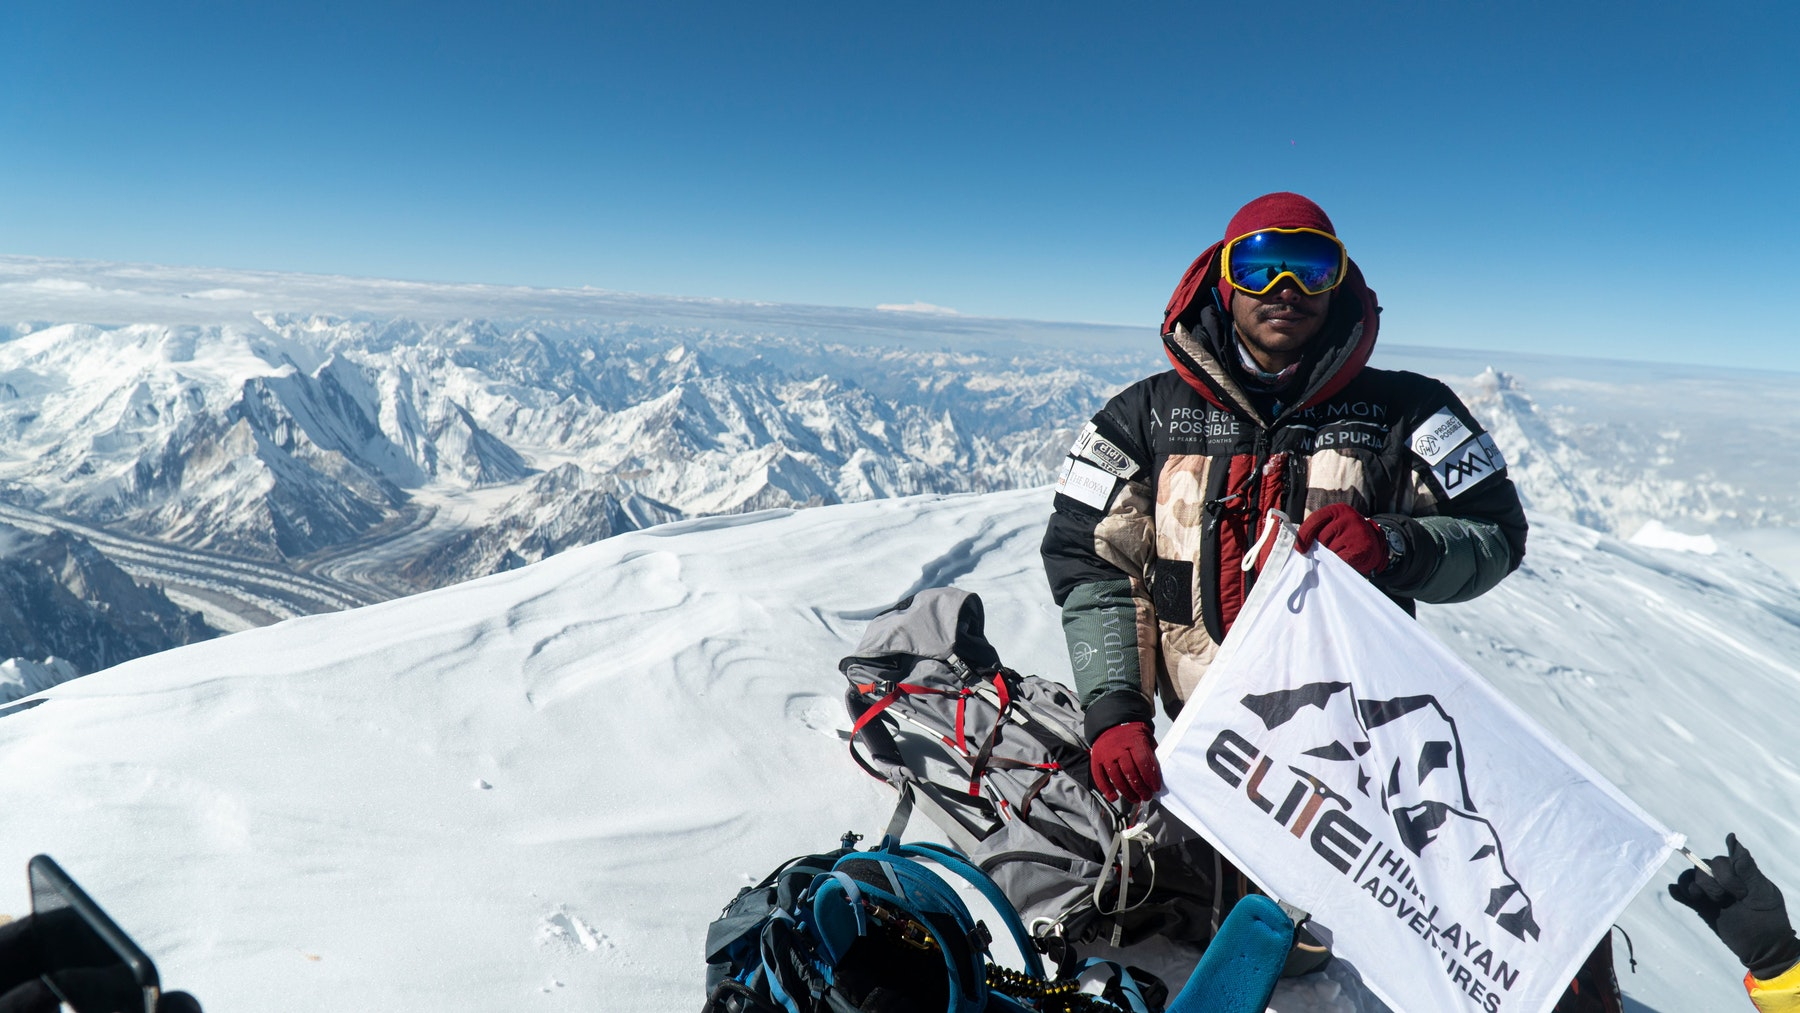 Nimsdai on the summit of K2